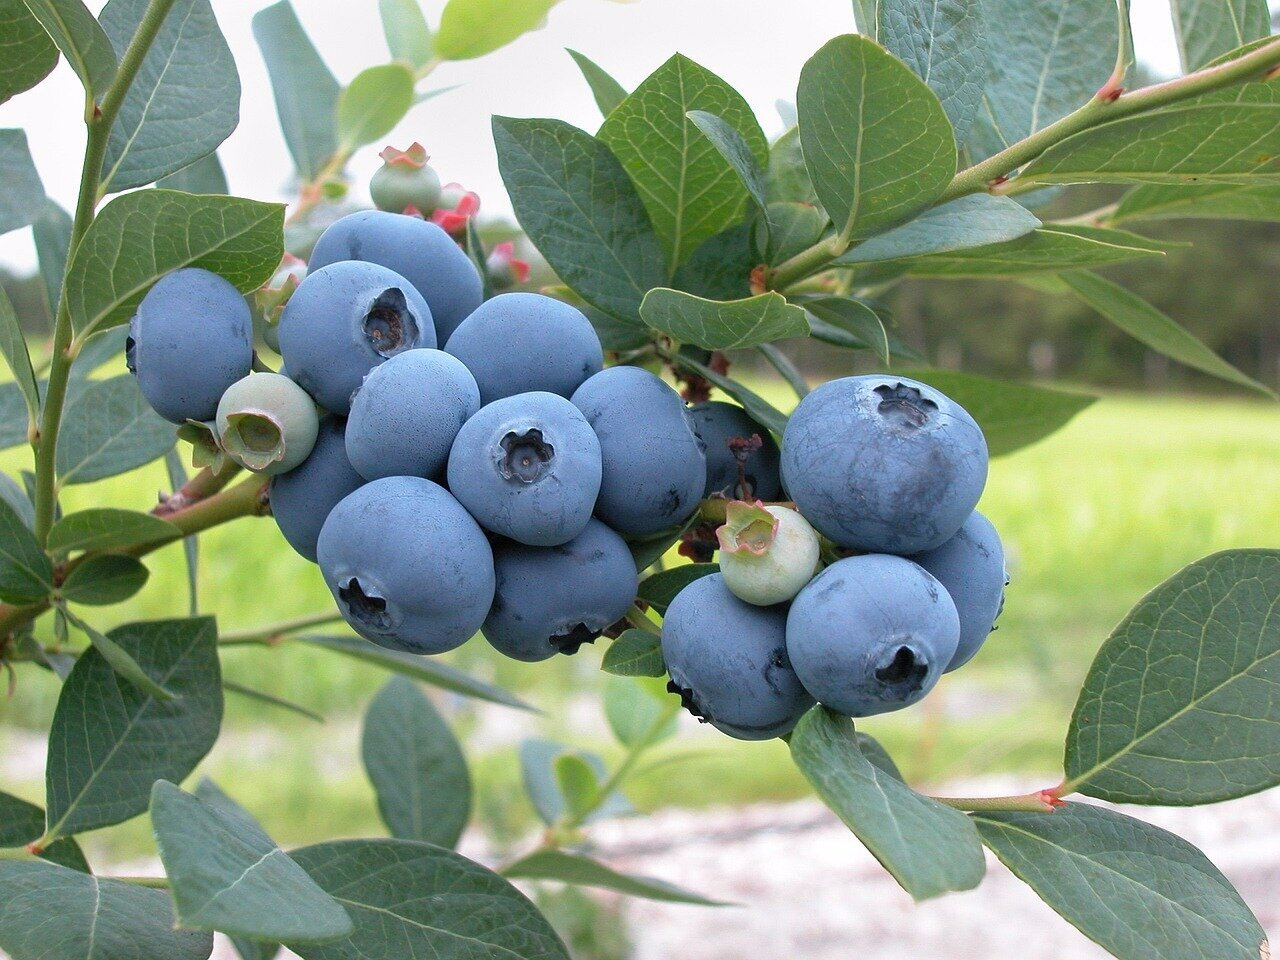 blueberries-1813420_1280.jpg